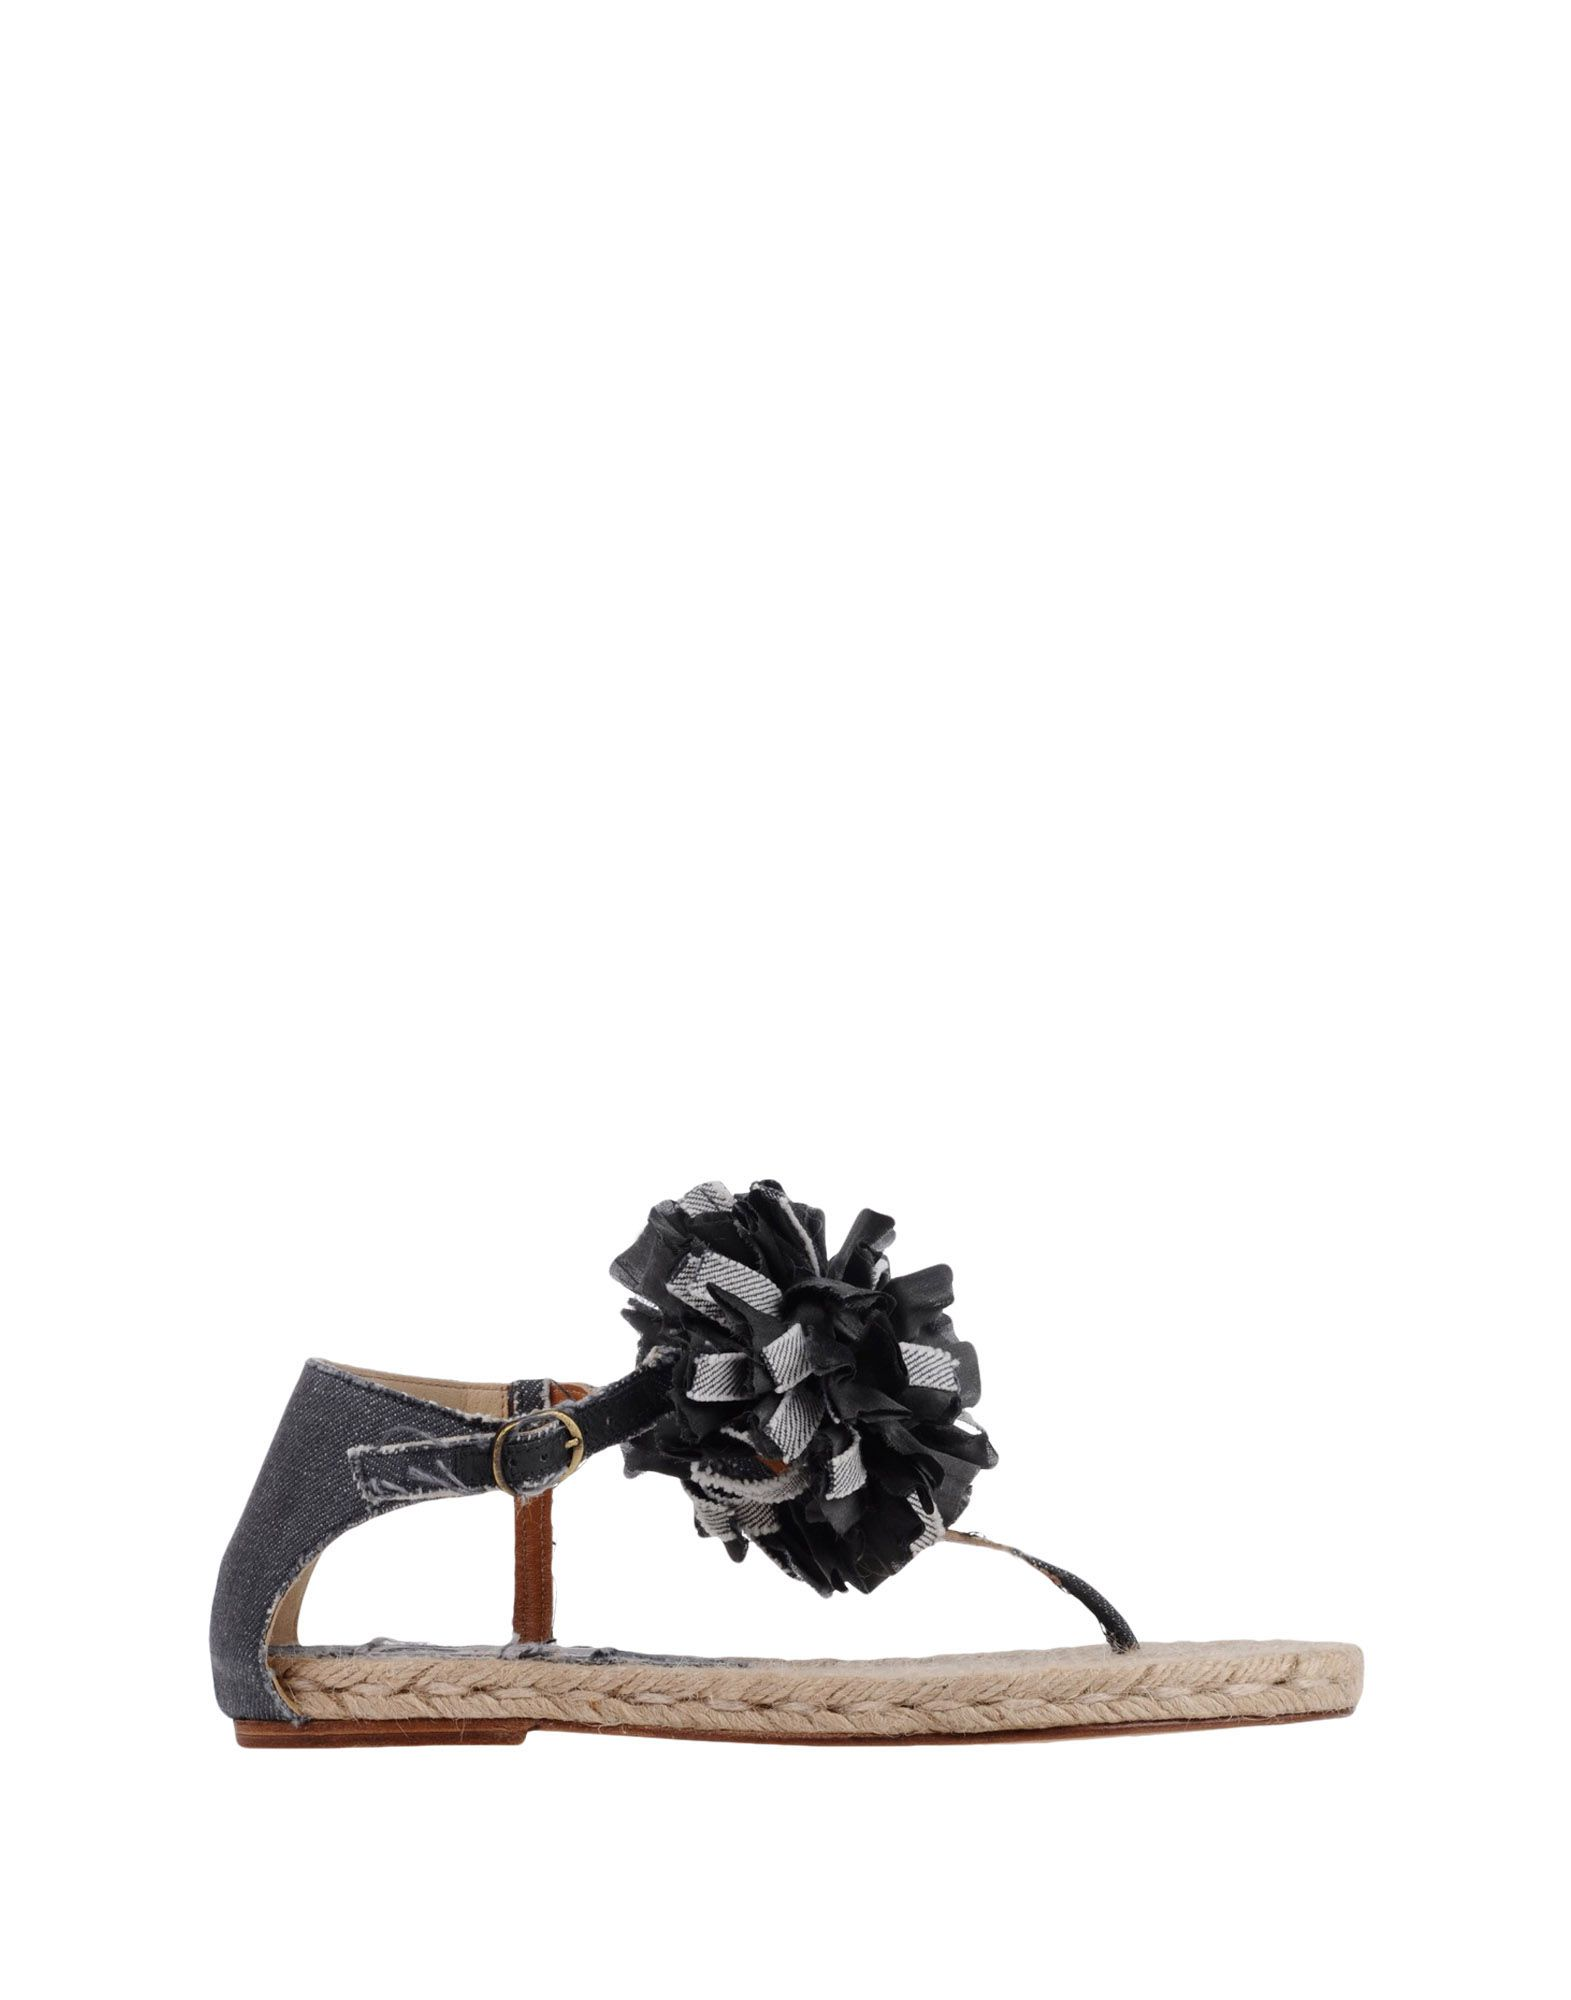 Lanvin Lanvin Flip Flops - Women Lanvin Lanvin Flip Flops online on  United Kingdom - 11192307DR 37951f